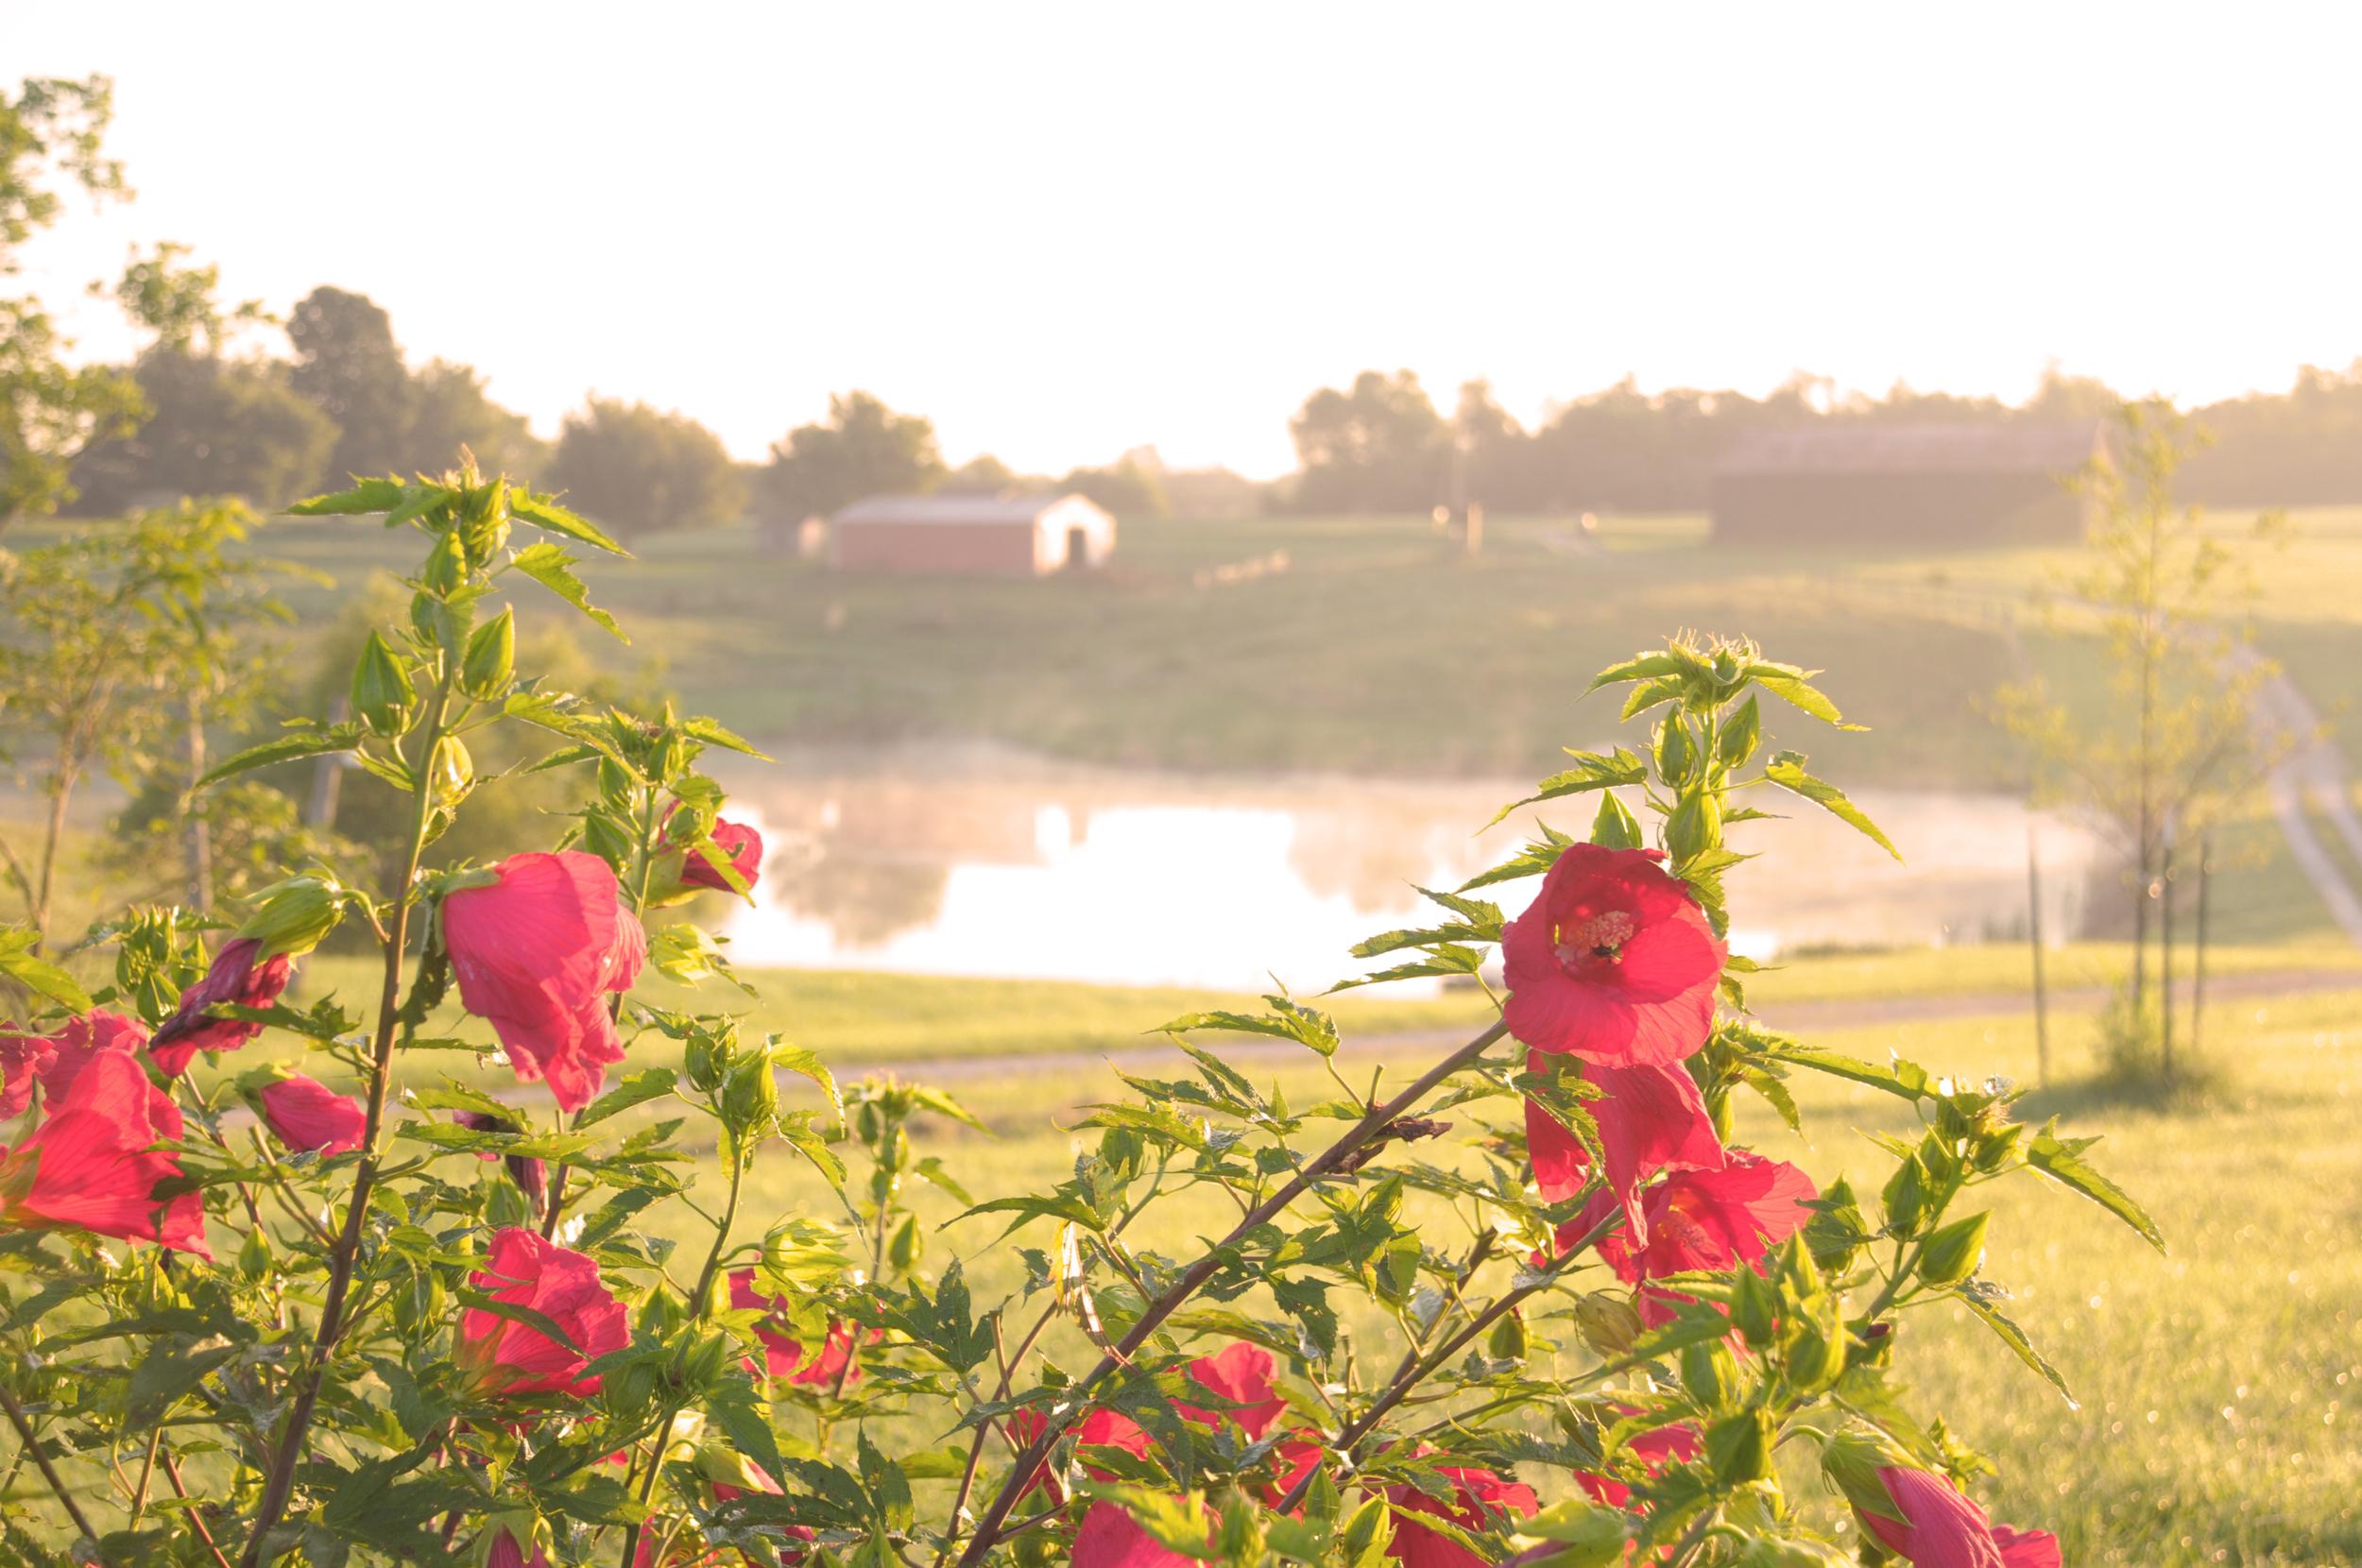 Farm_flower1.jpg